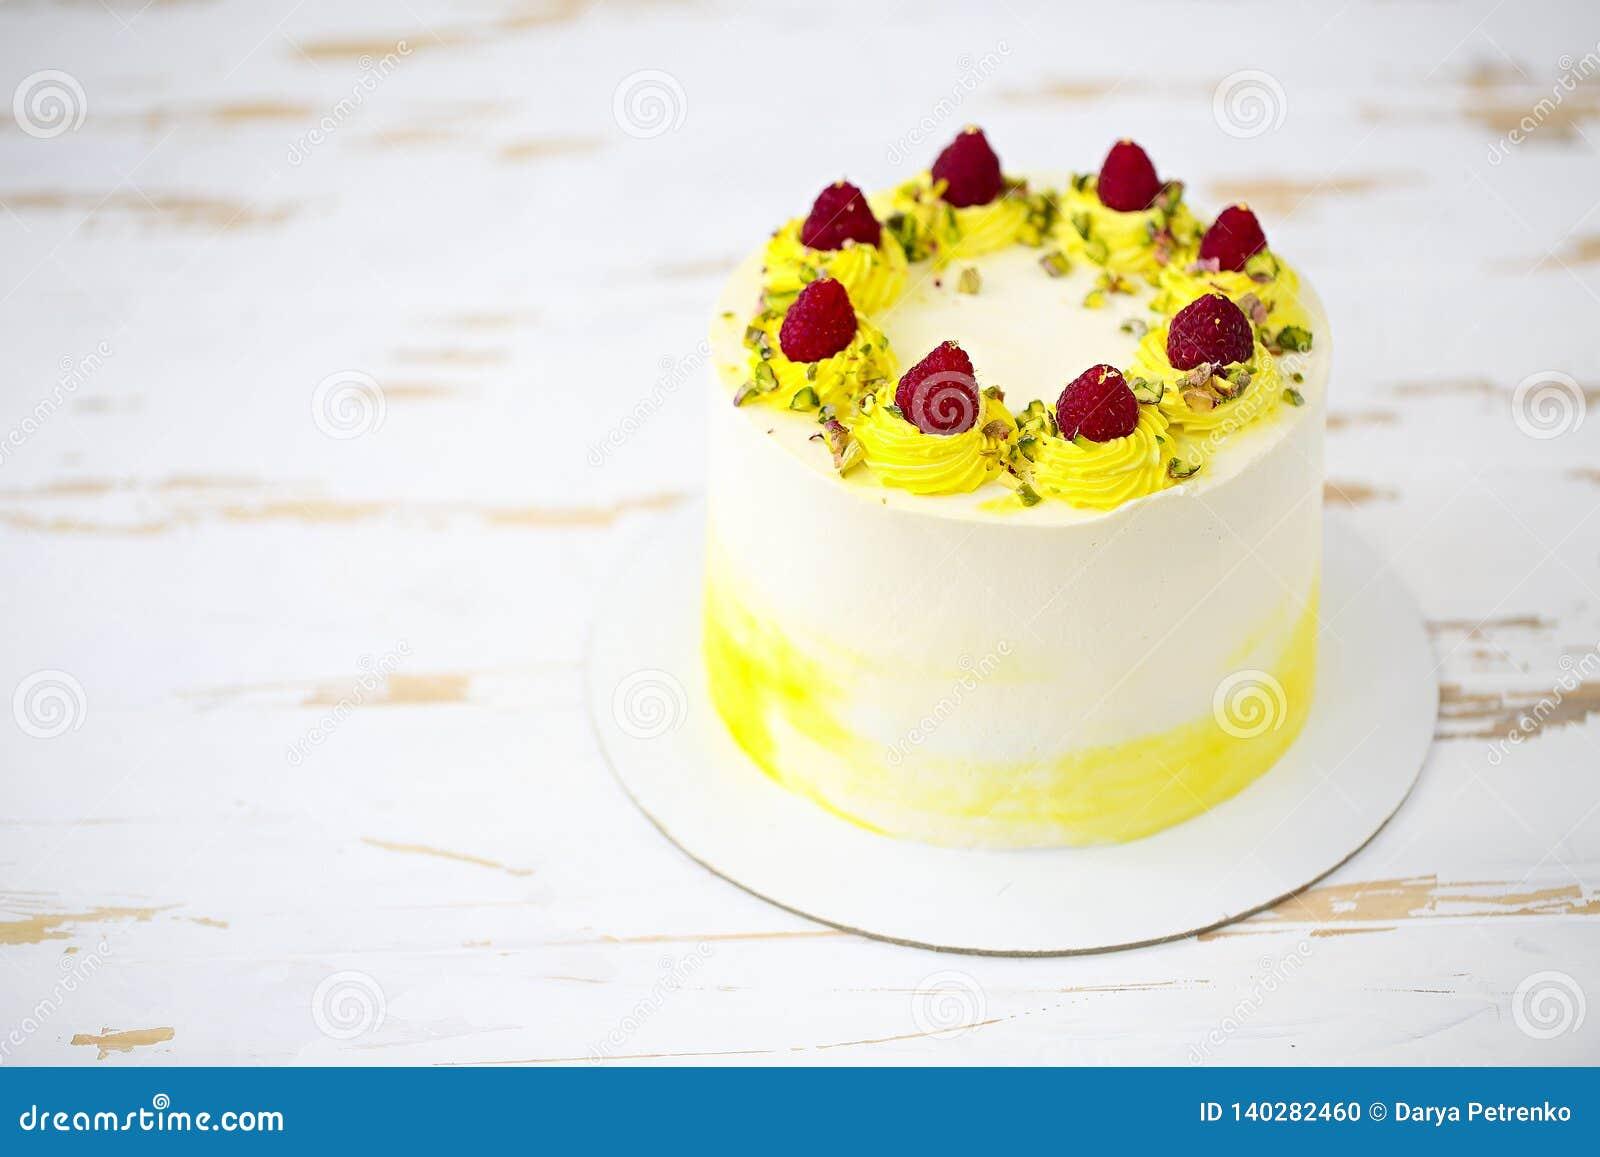 Beautiful Happy Birthday Cake With Mascarpone Decorated Raspberry Pistachio On The Stand